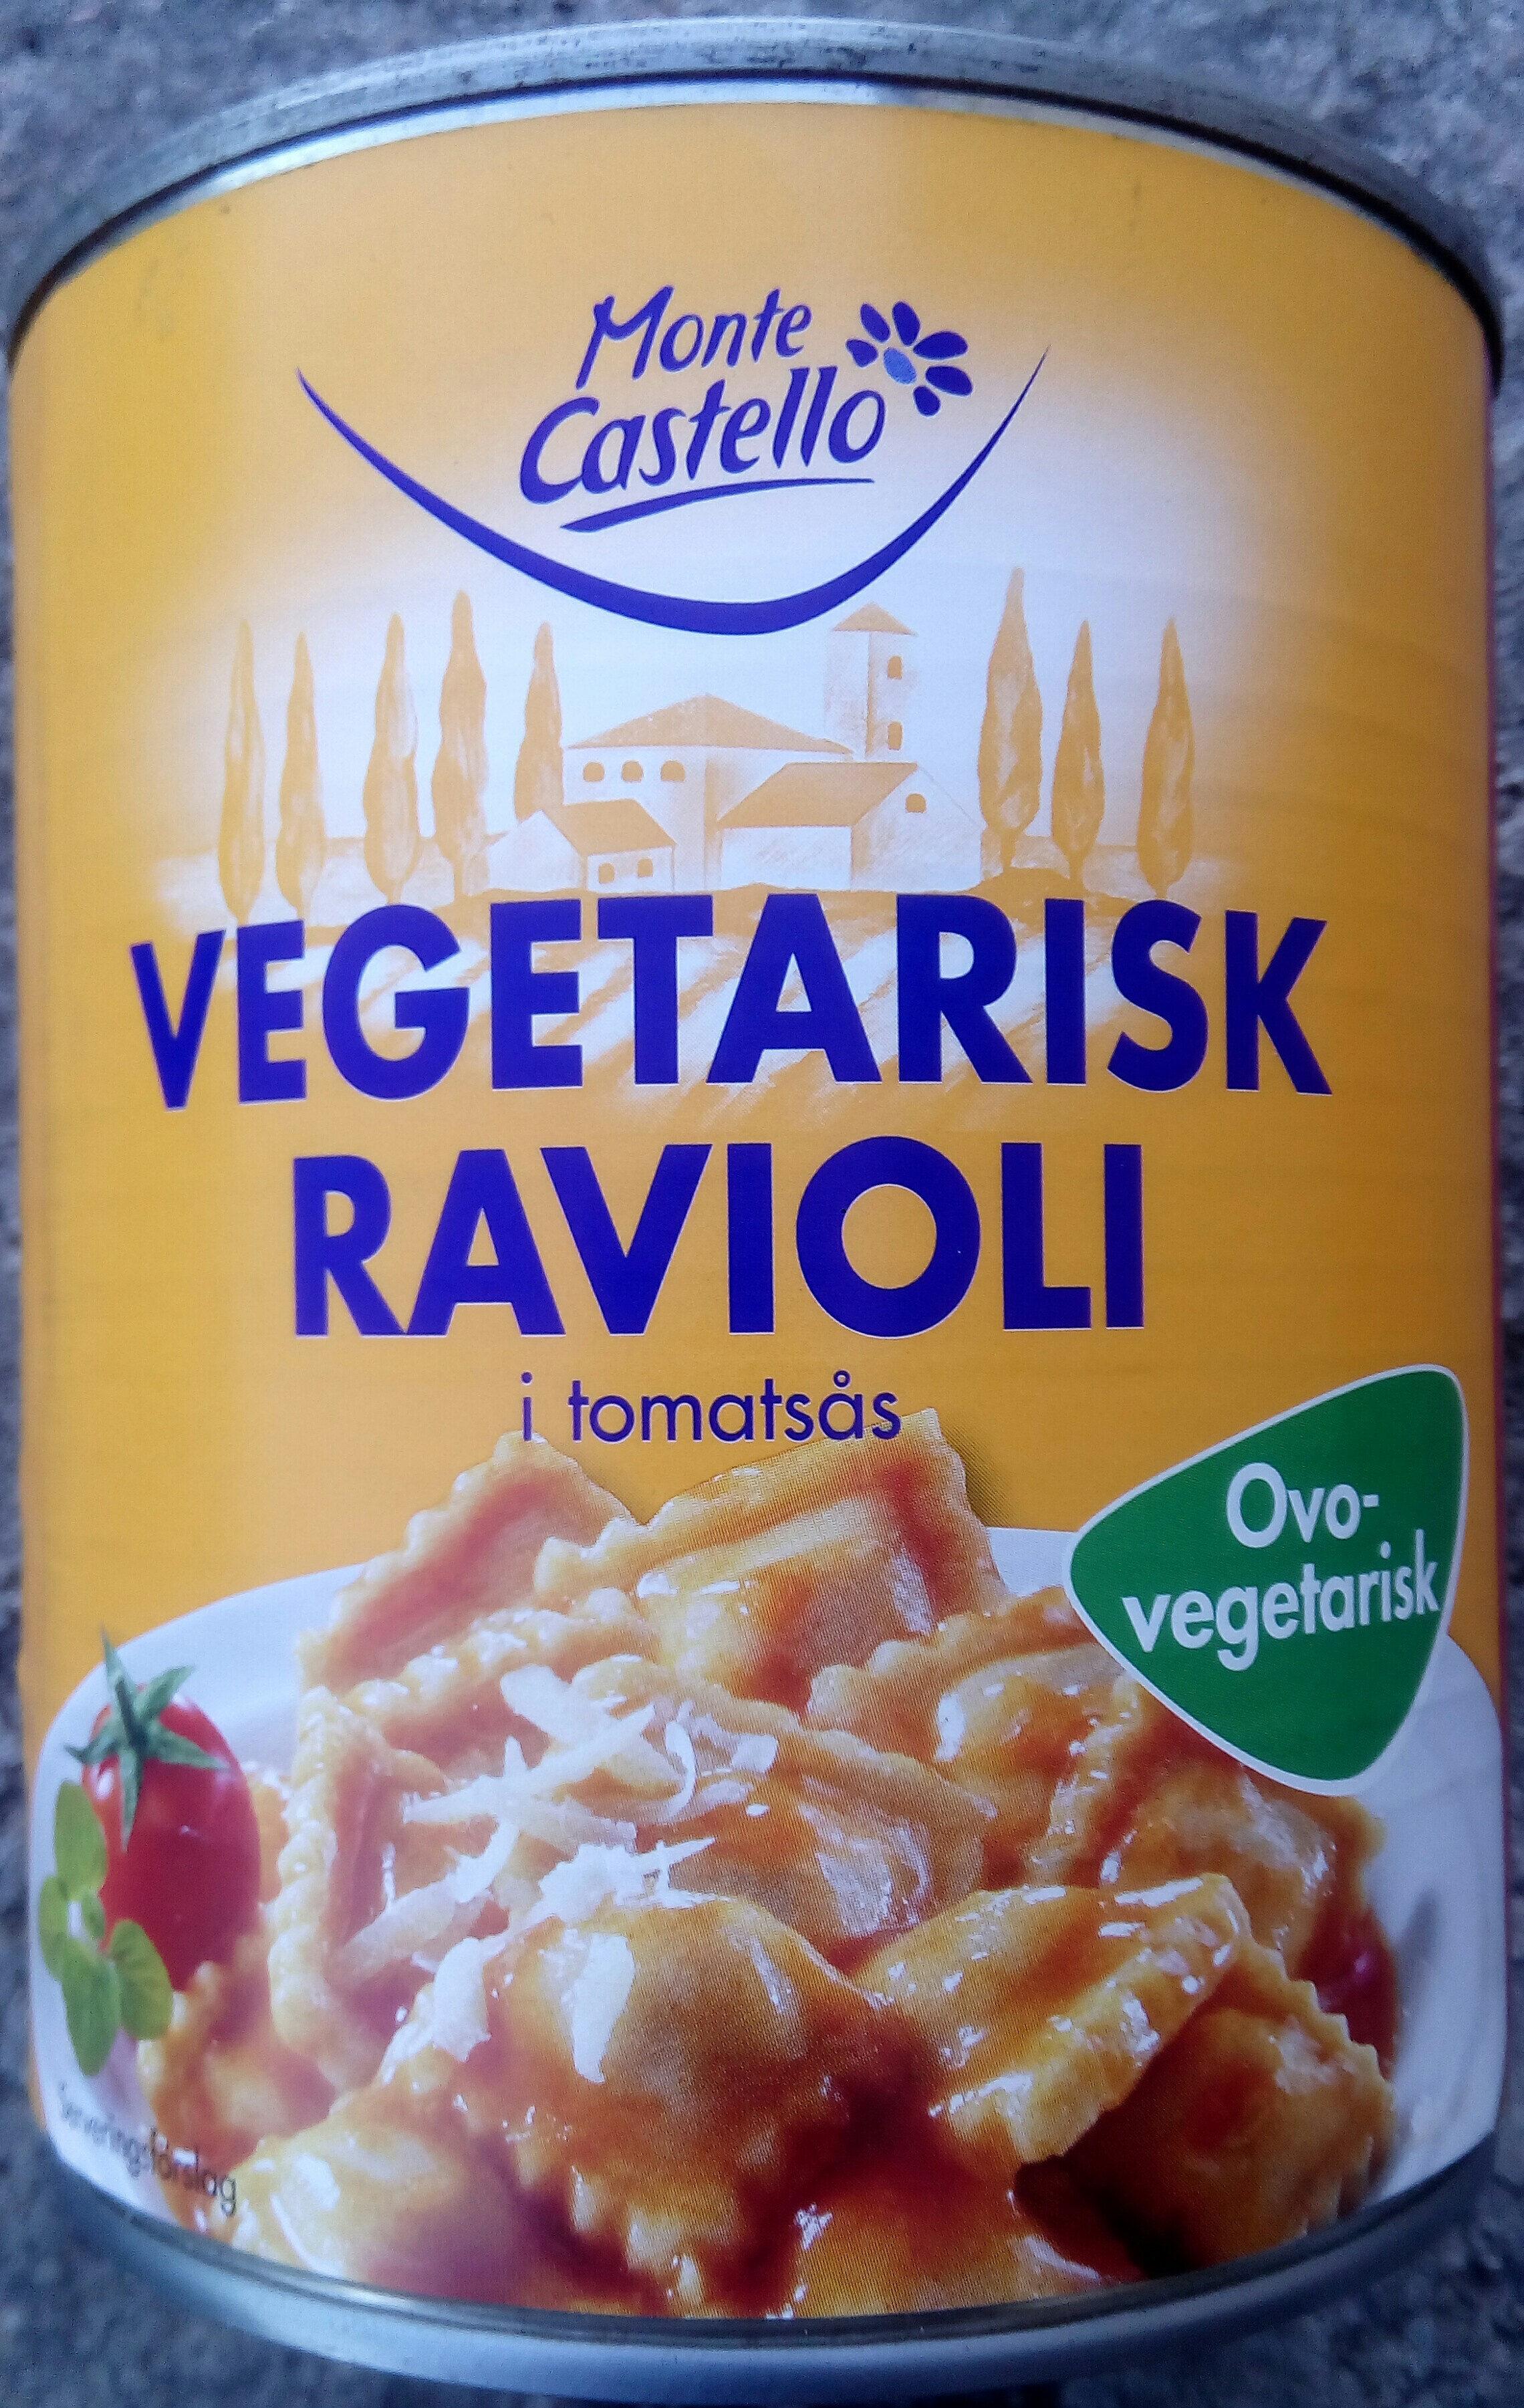 Monte Castello Vegetarisk ravioli i tomatsås - Produit - sv